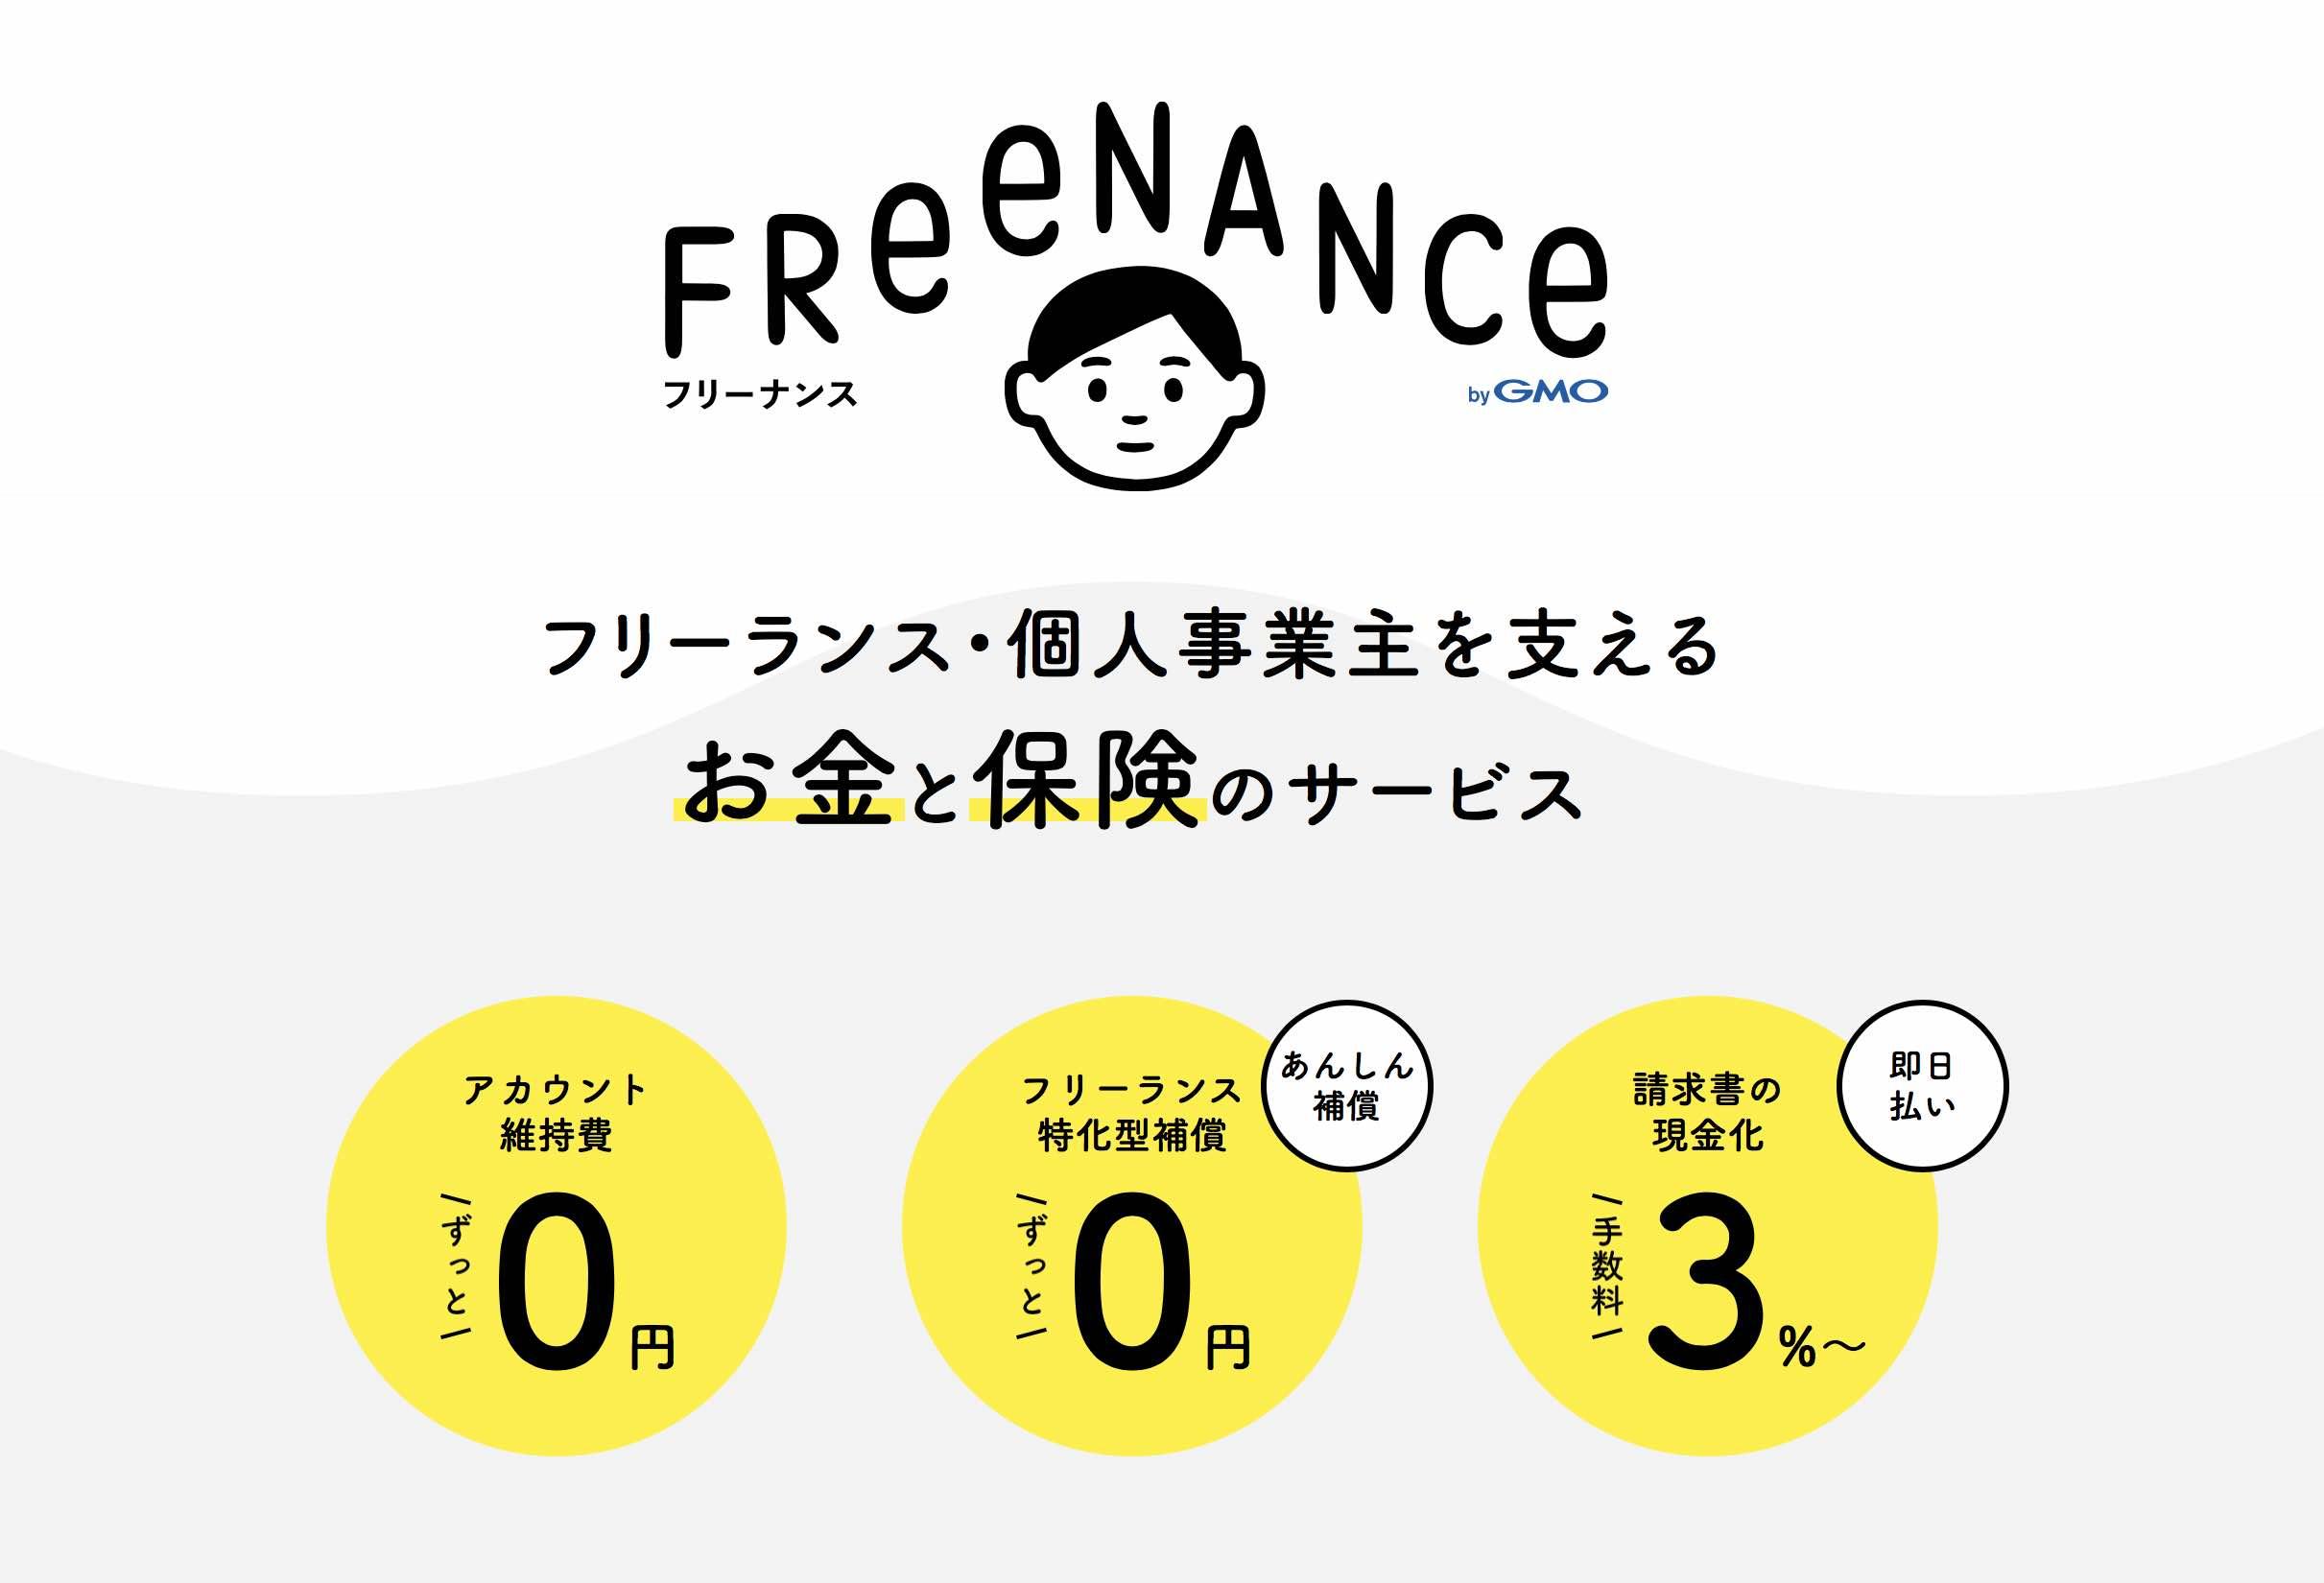 FREENANCE(フリーナンス)の審査難易度